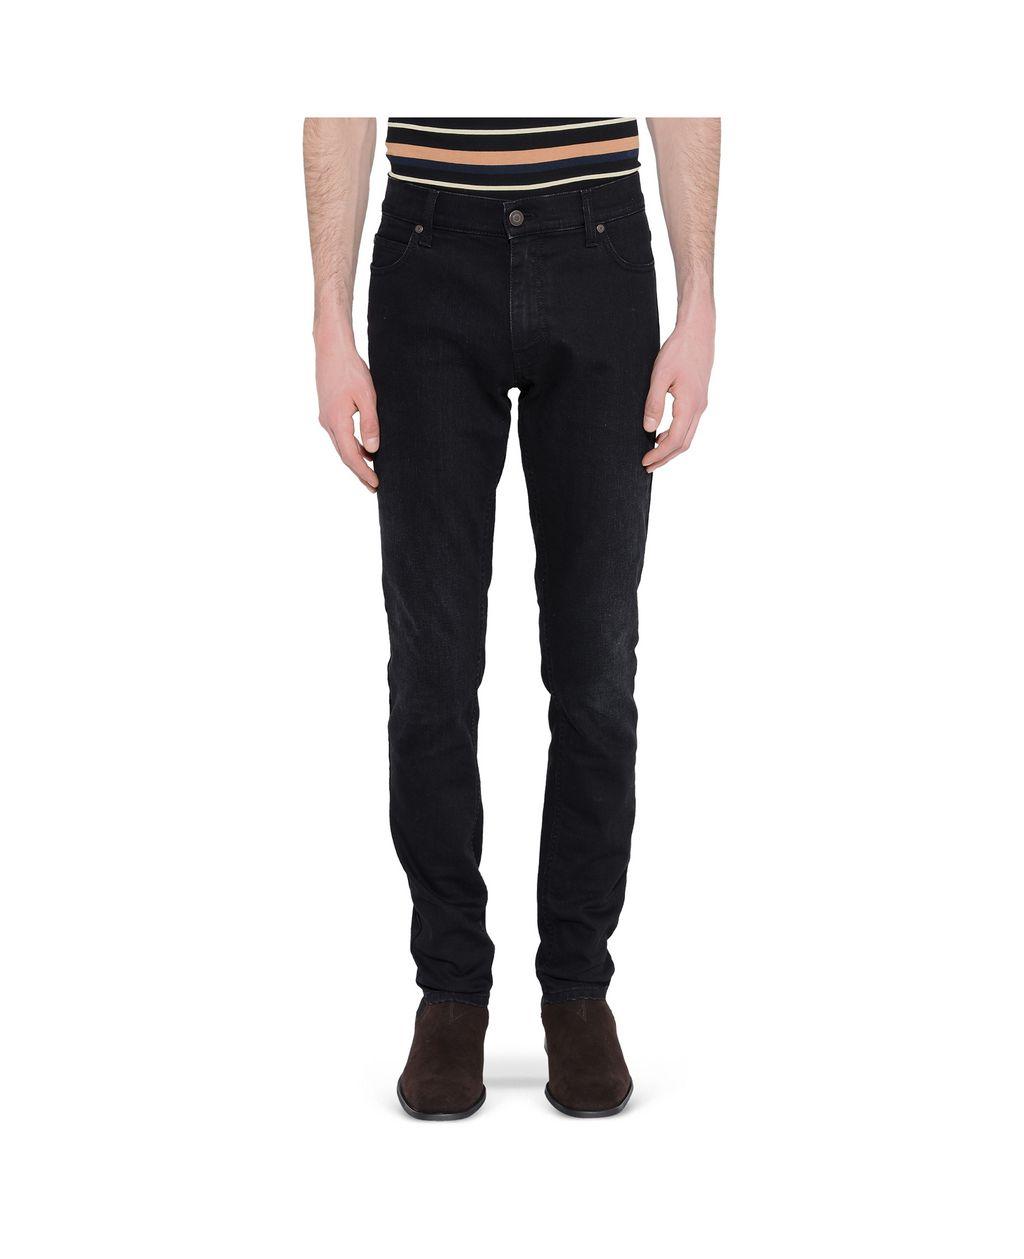 Black Dominic Skinny Jeans - STELLA McCARTNEY MEN